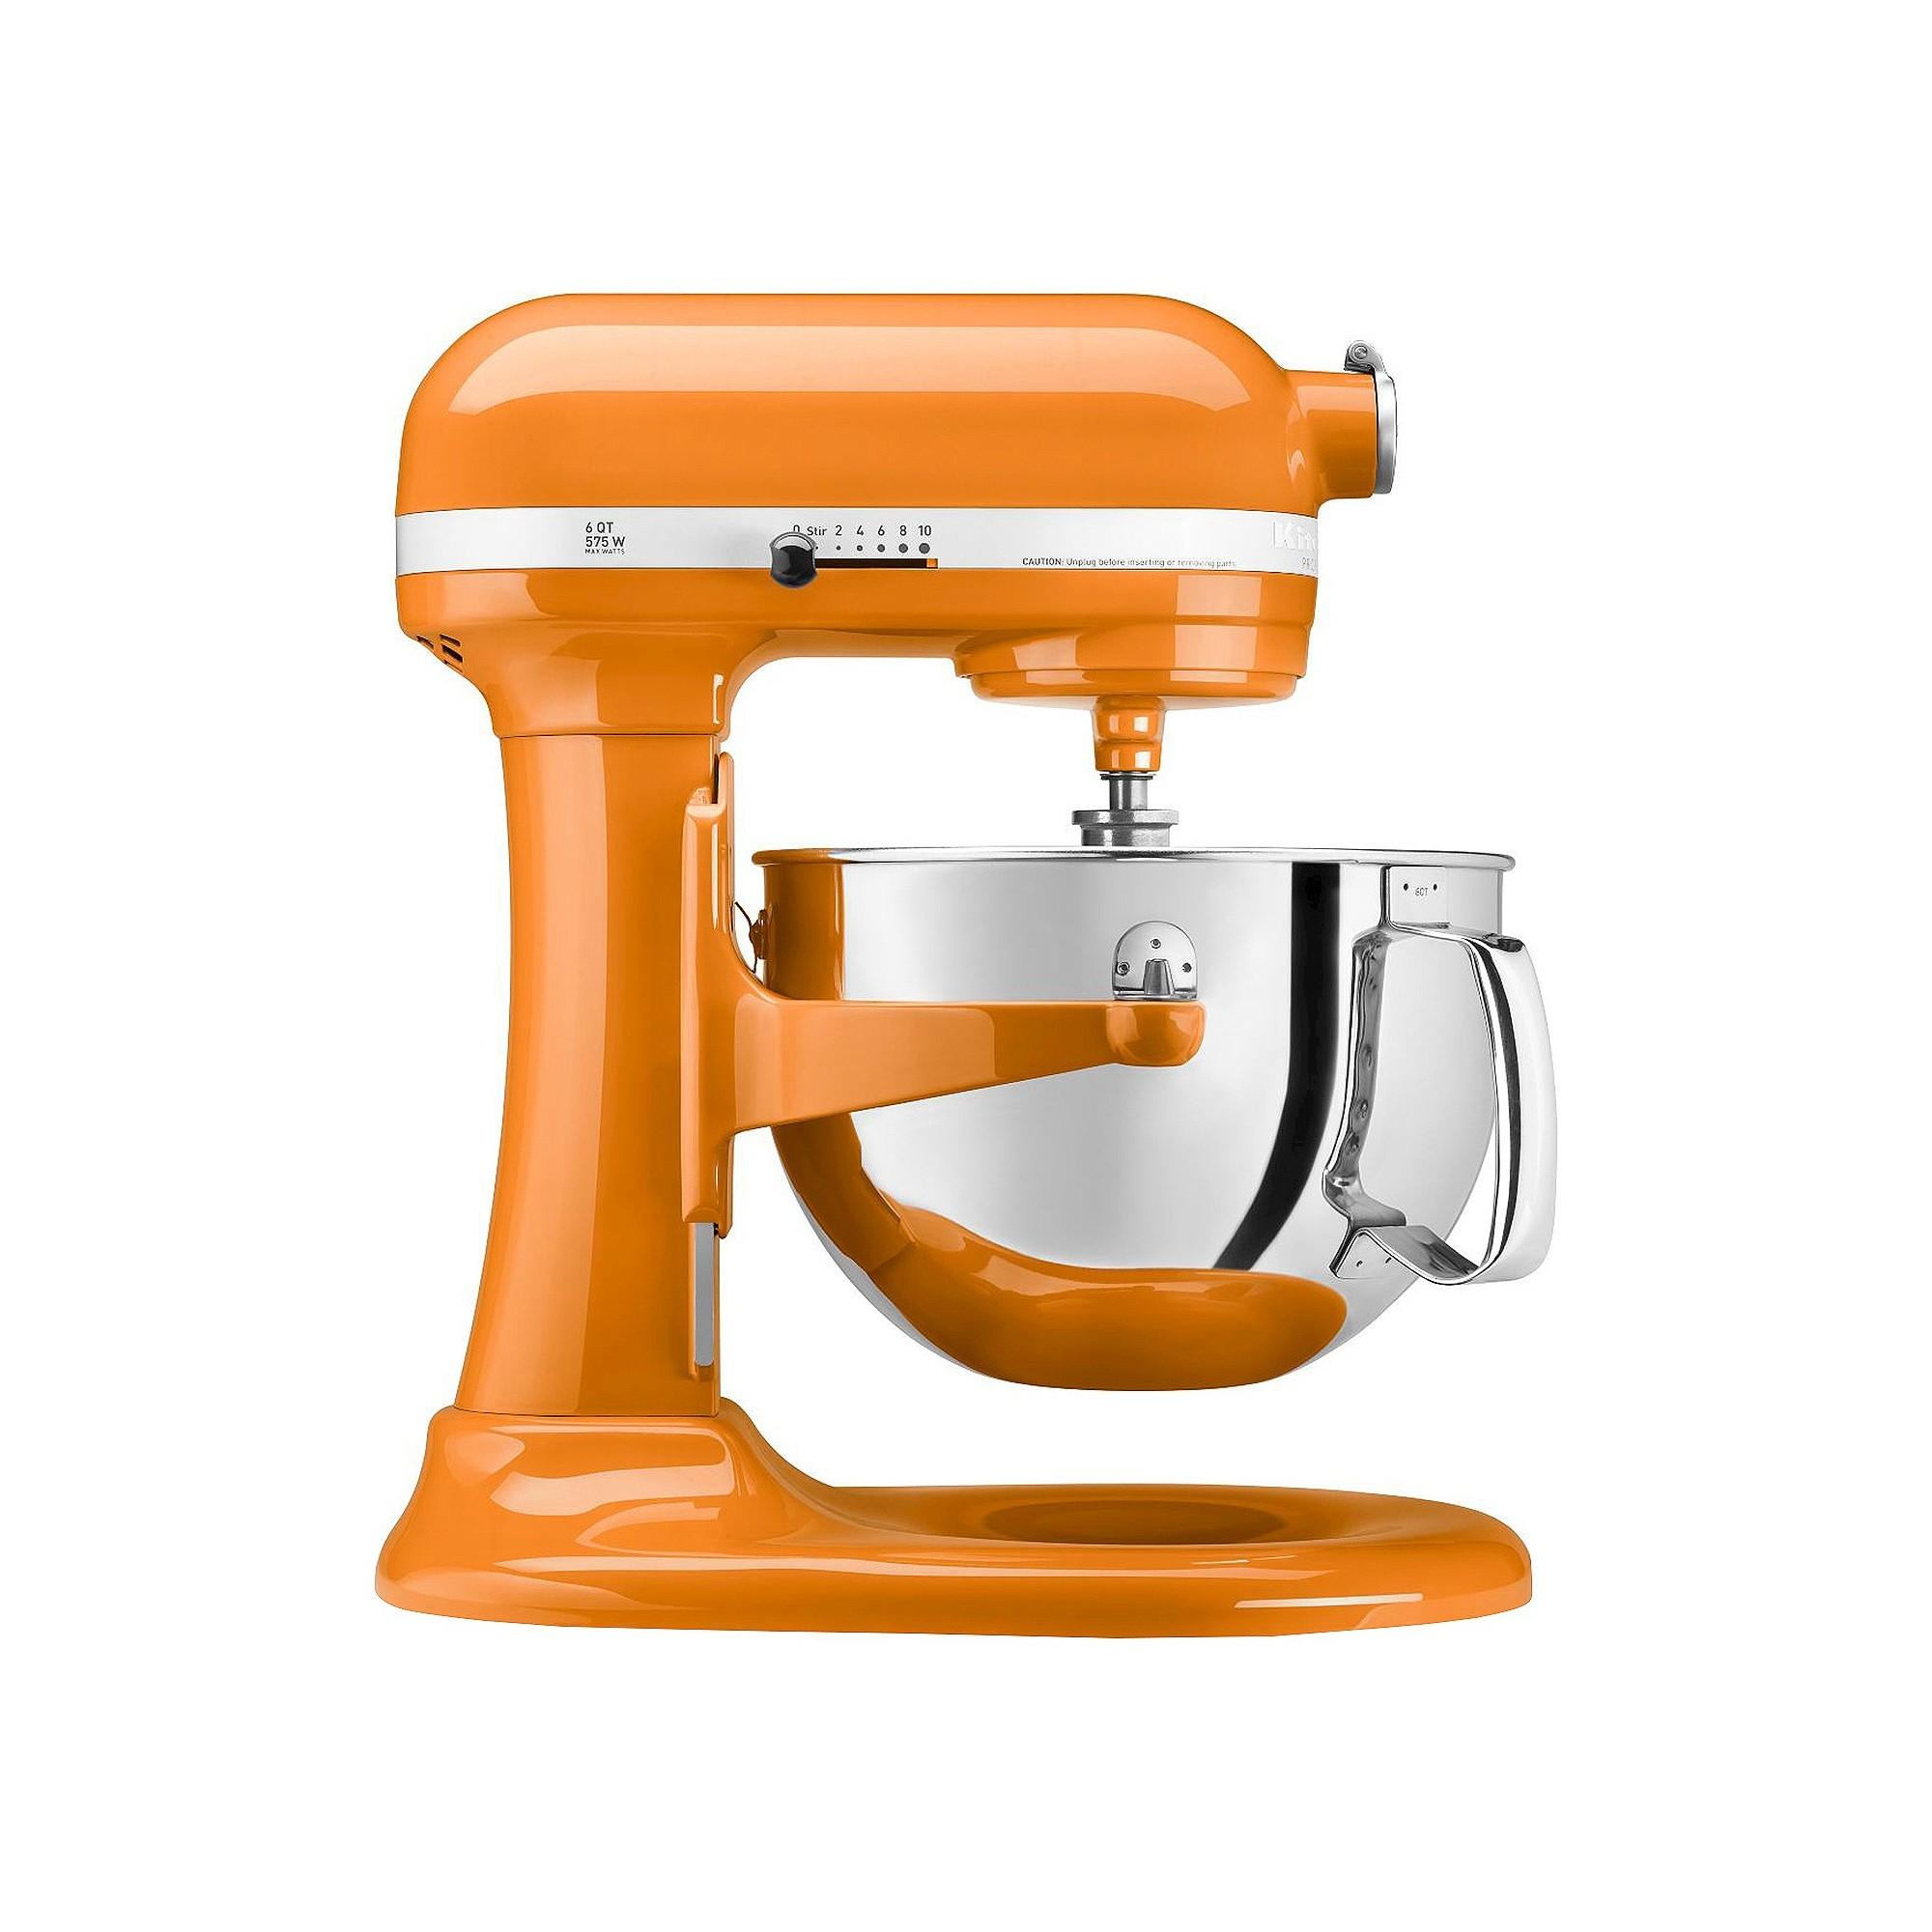 KitchenAid Professional 600 Series 6-Quart Bowl-Lift Stand Mixer ...